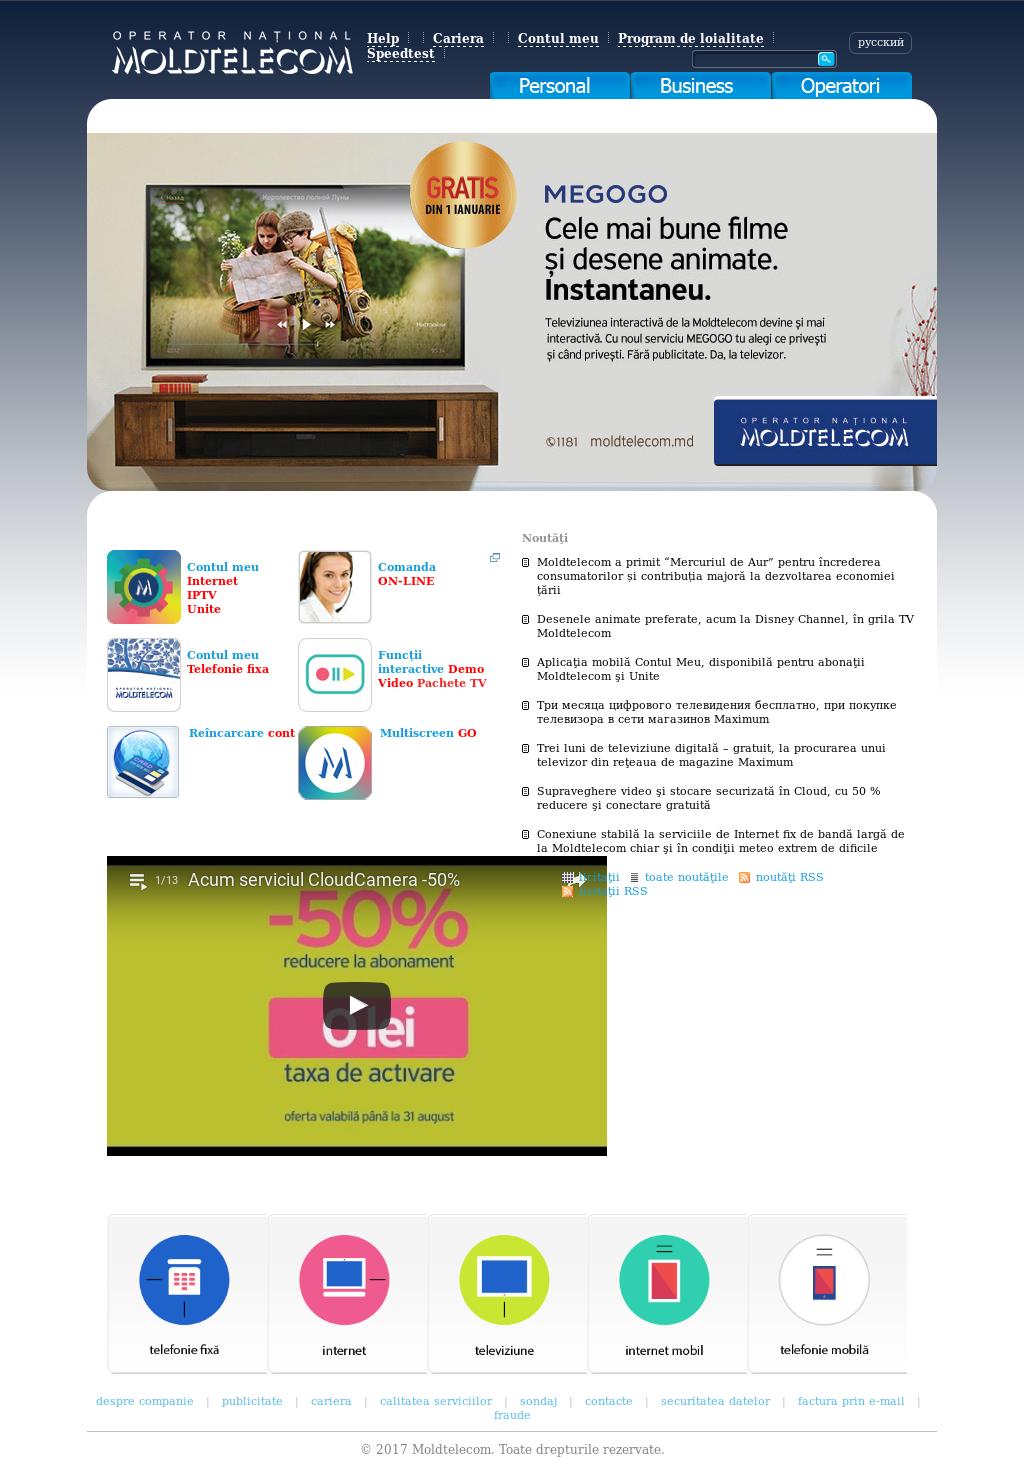 Moldtelecom Competitors, Revenue and Employees - Owler